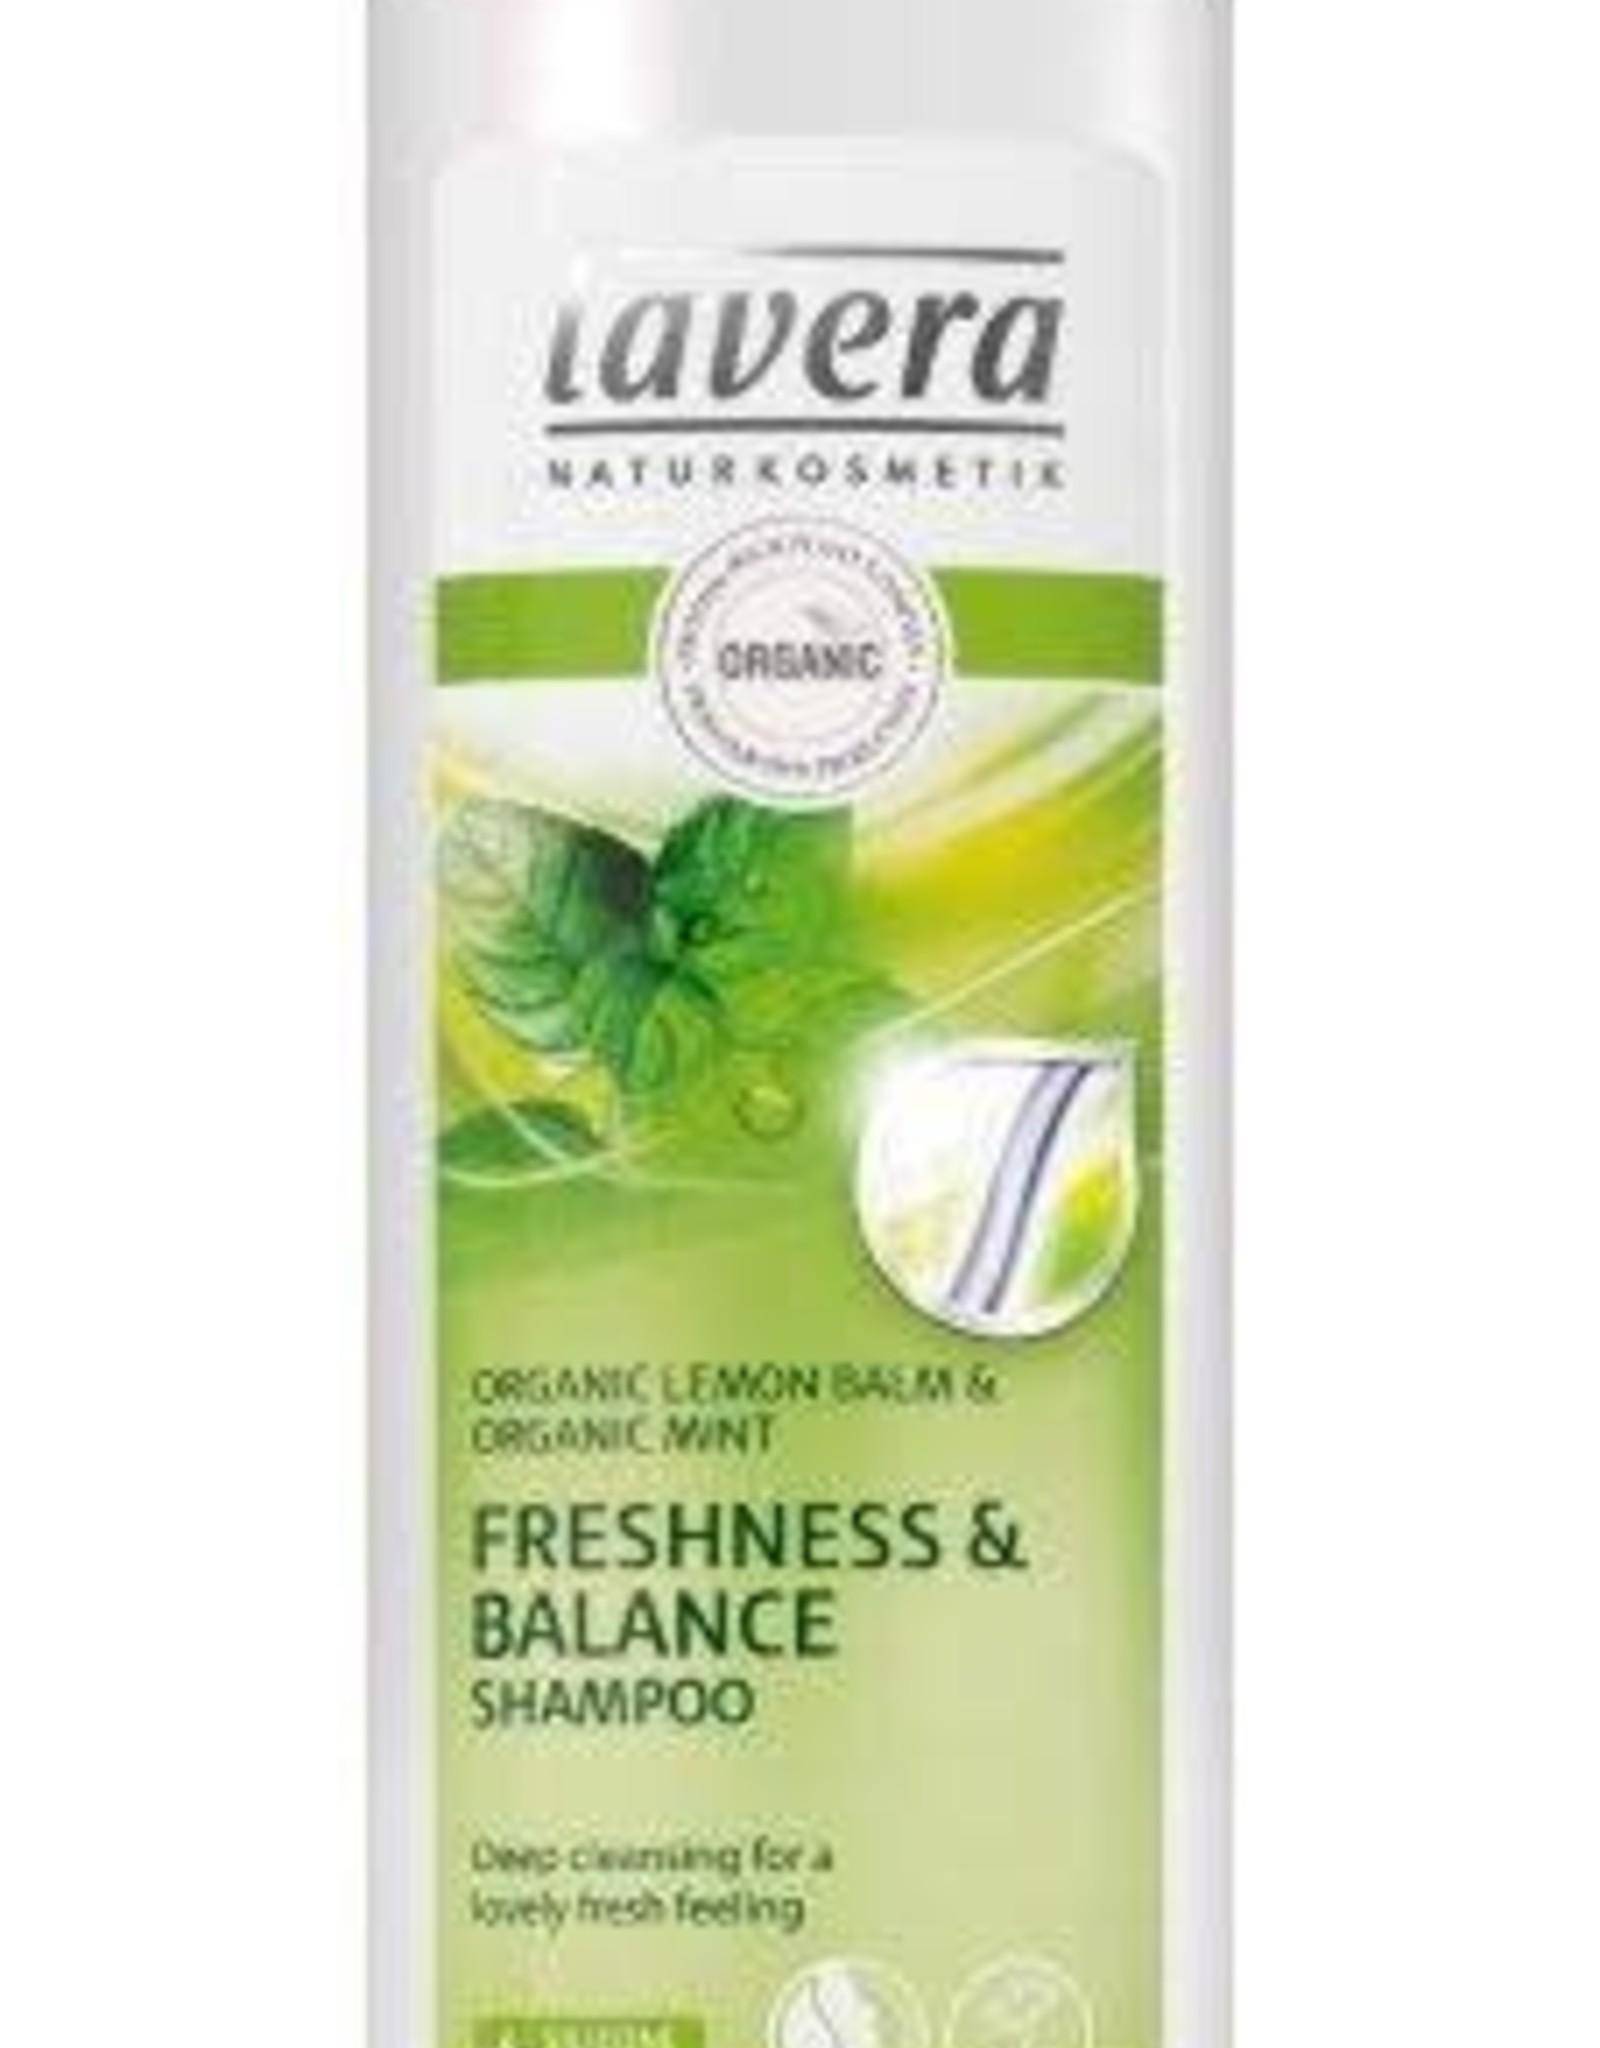 Lavera Shampoo freshness & balance 250 ml